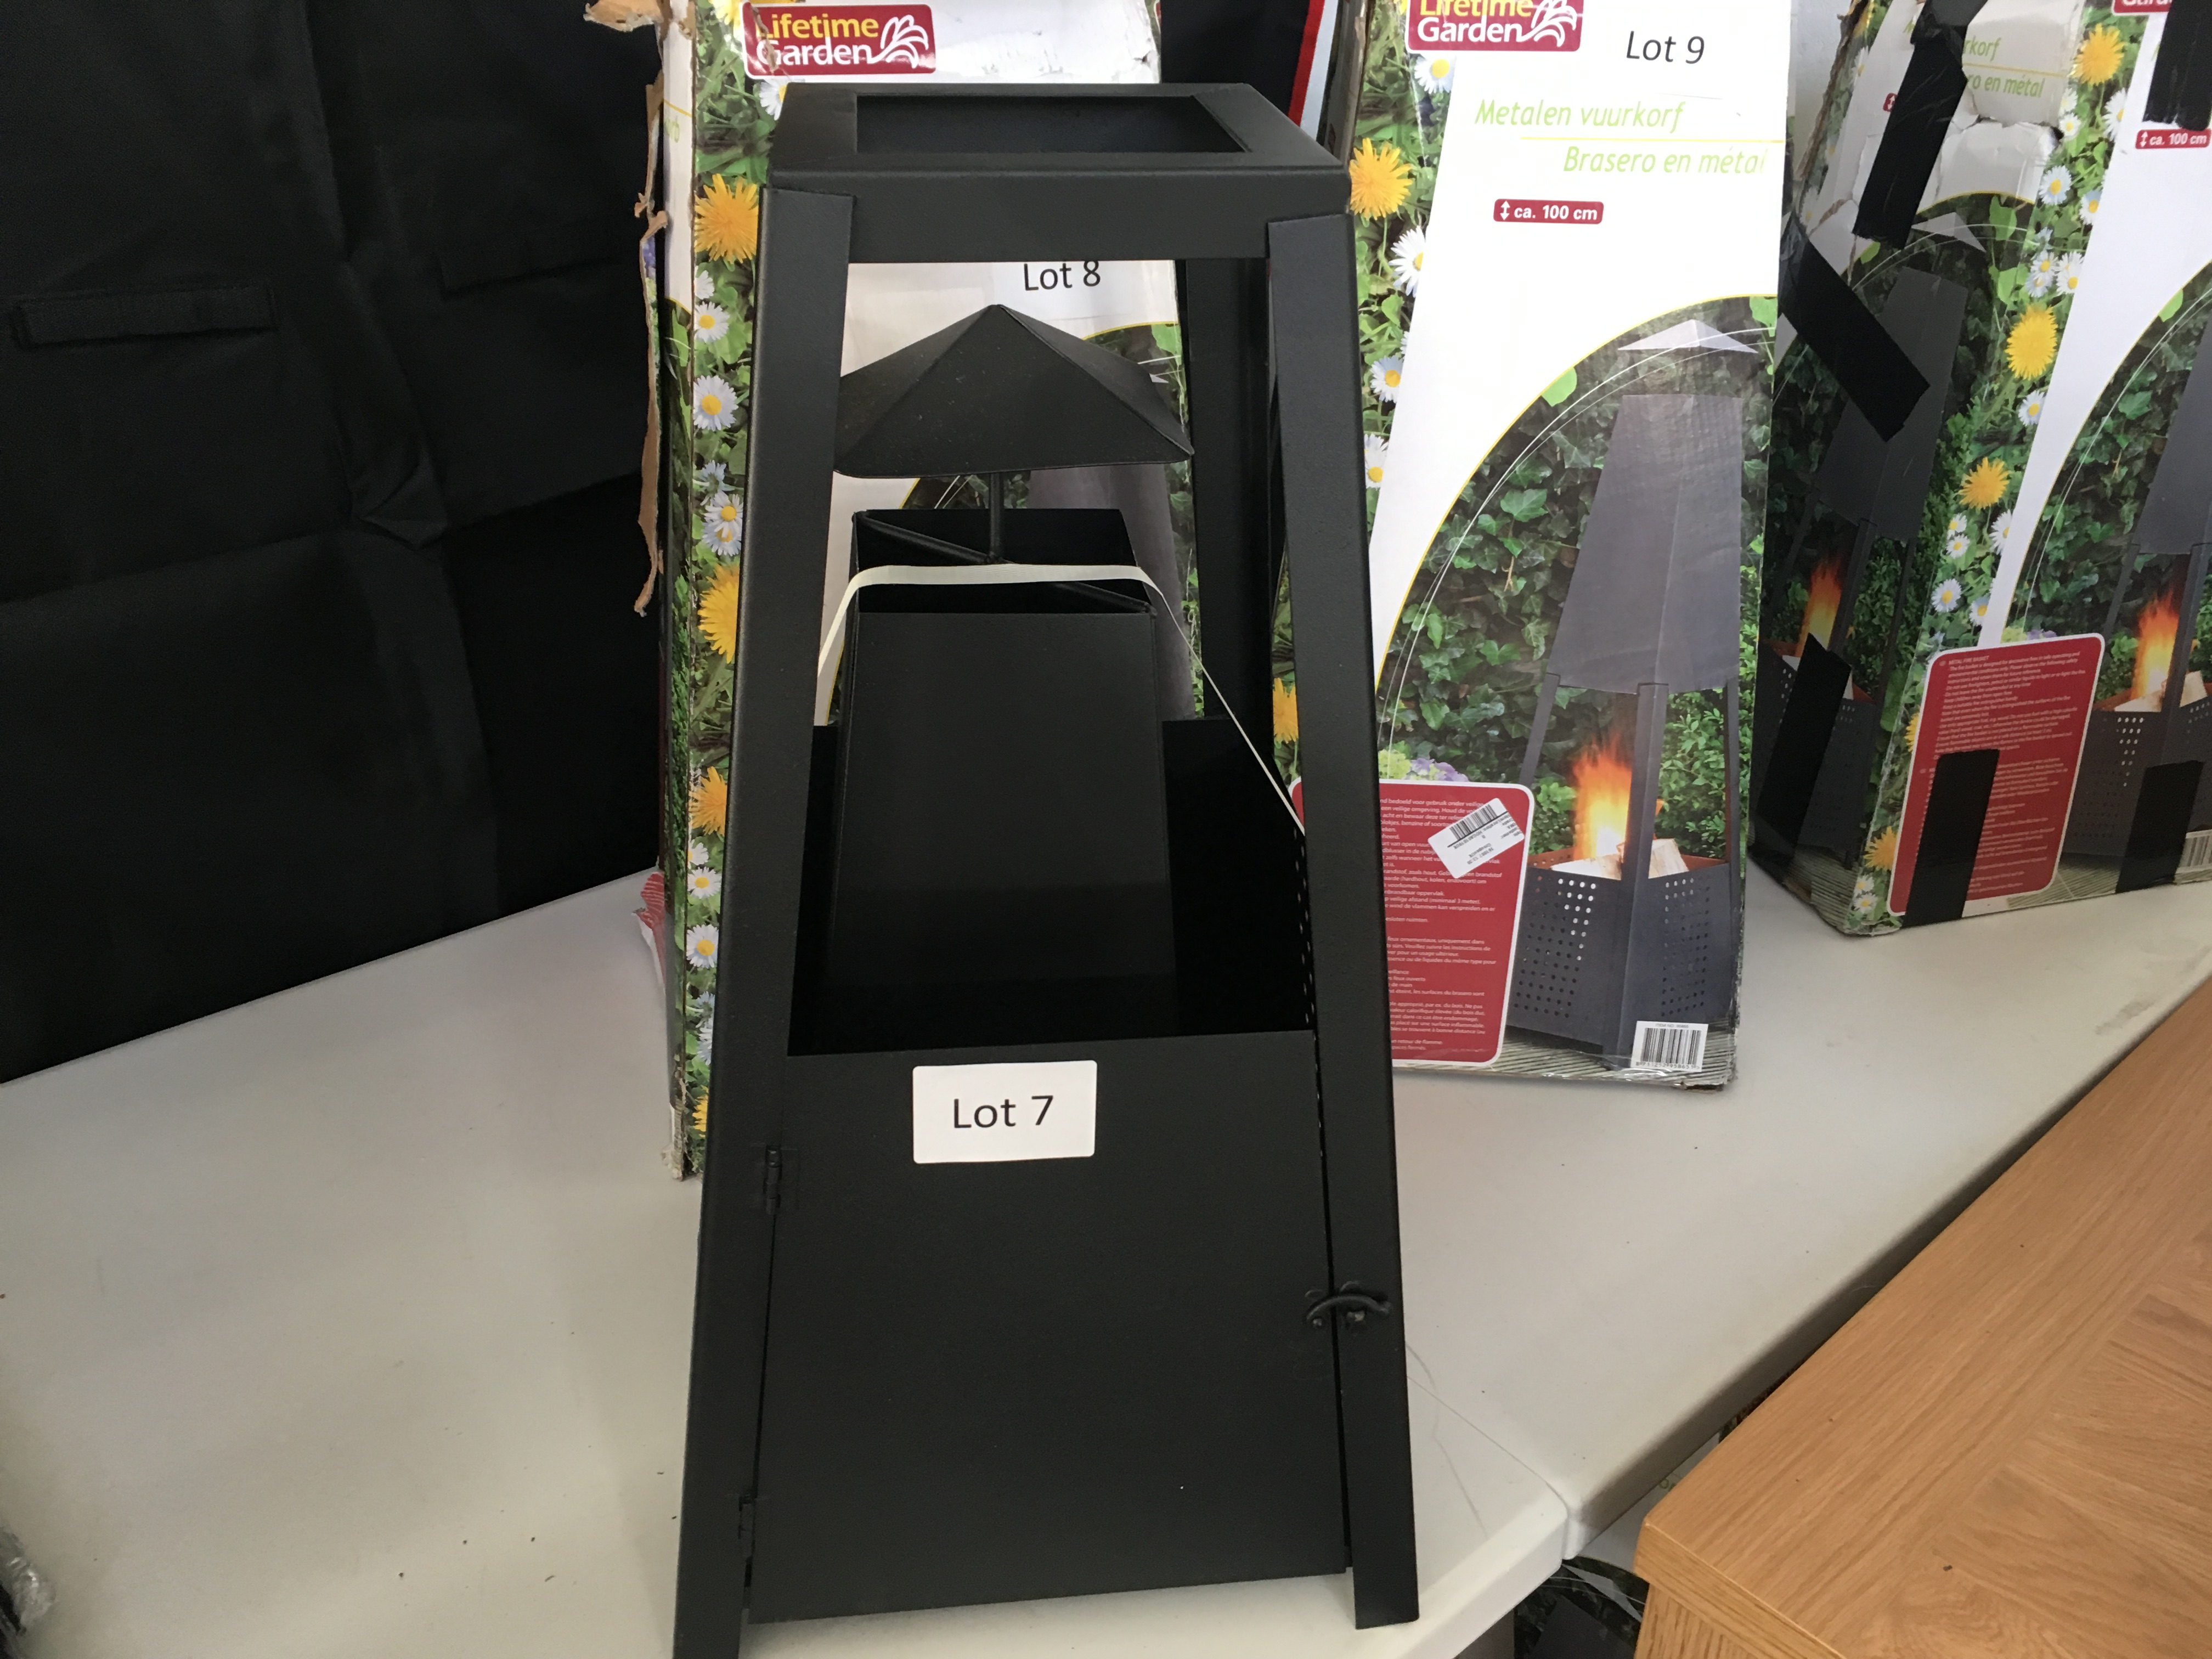 Lot 7 - Lifetime Garden, metal fire basket. Bad packaging.